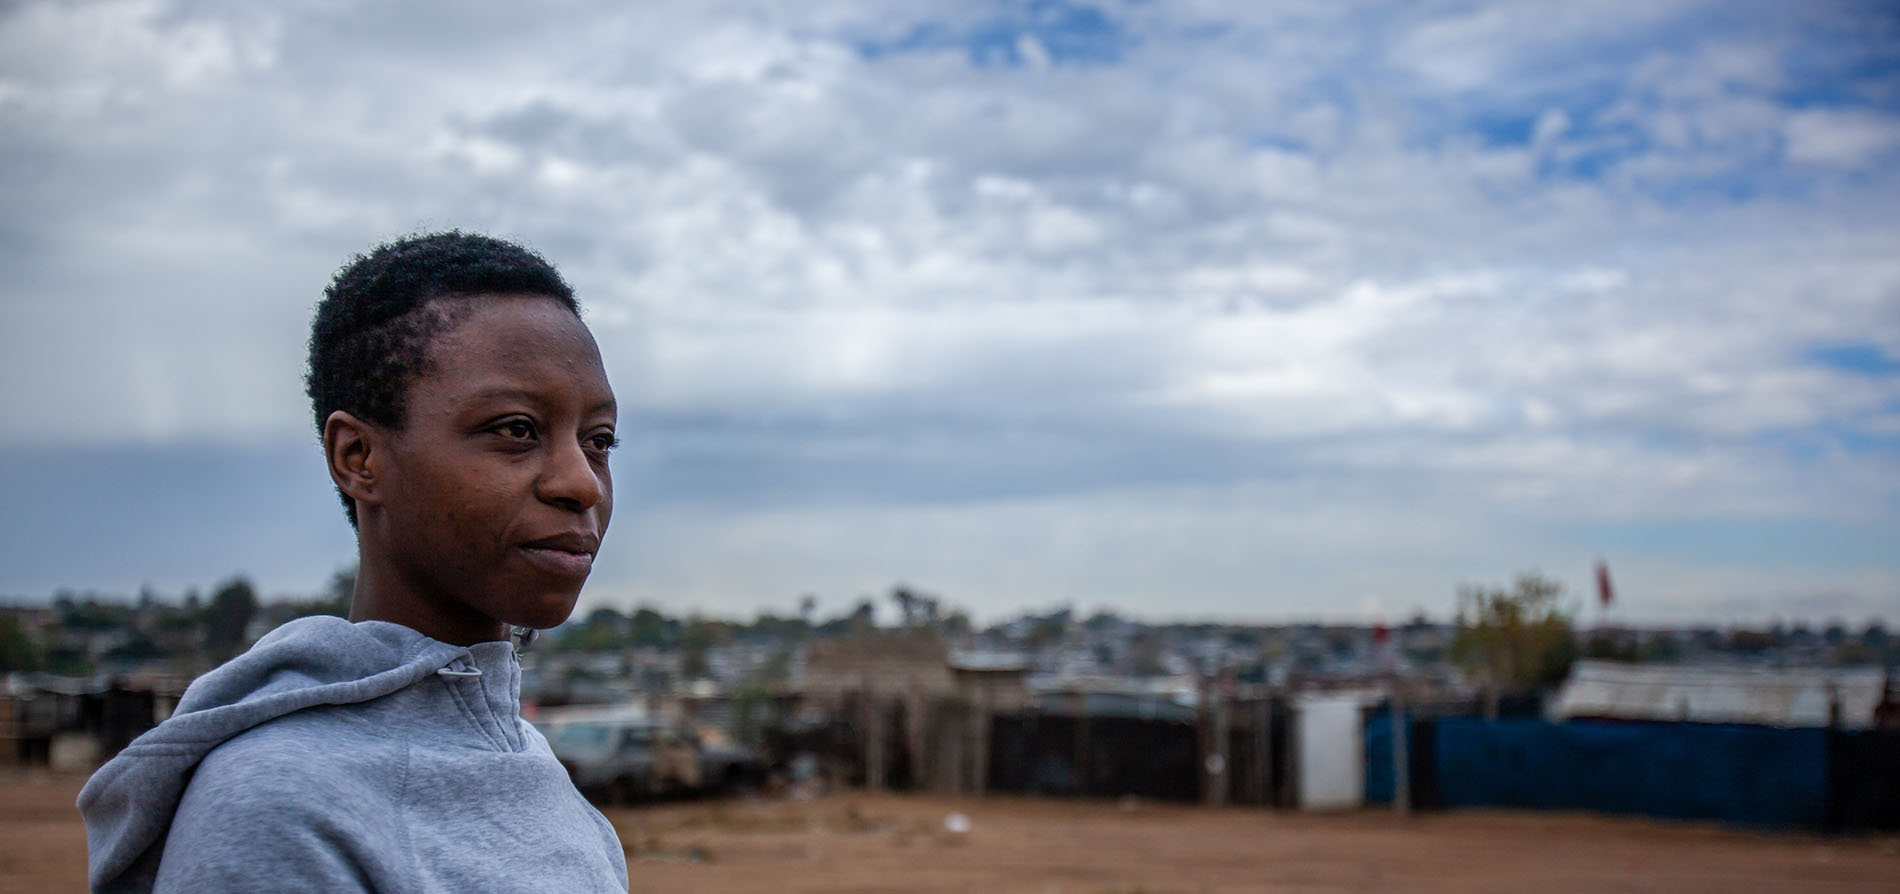 homepage_option_woman_beautiful_love_justice_anti_trafficking_africa.jpg